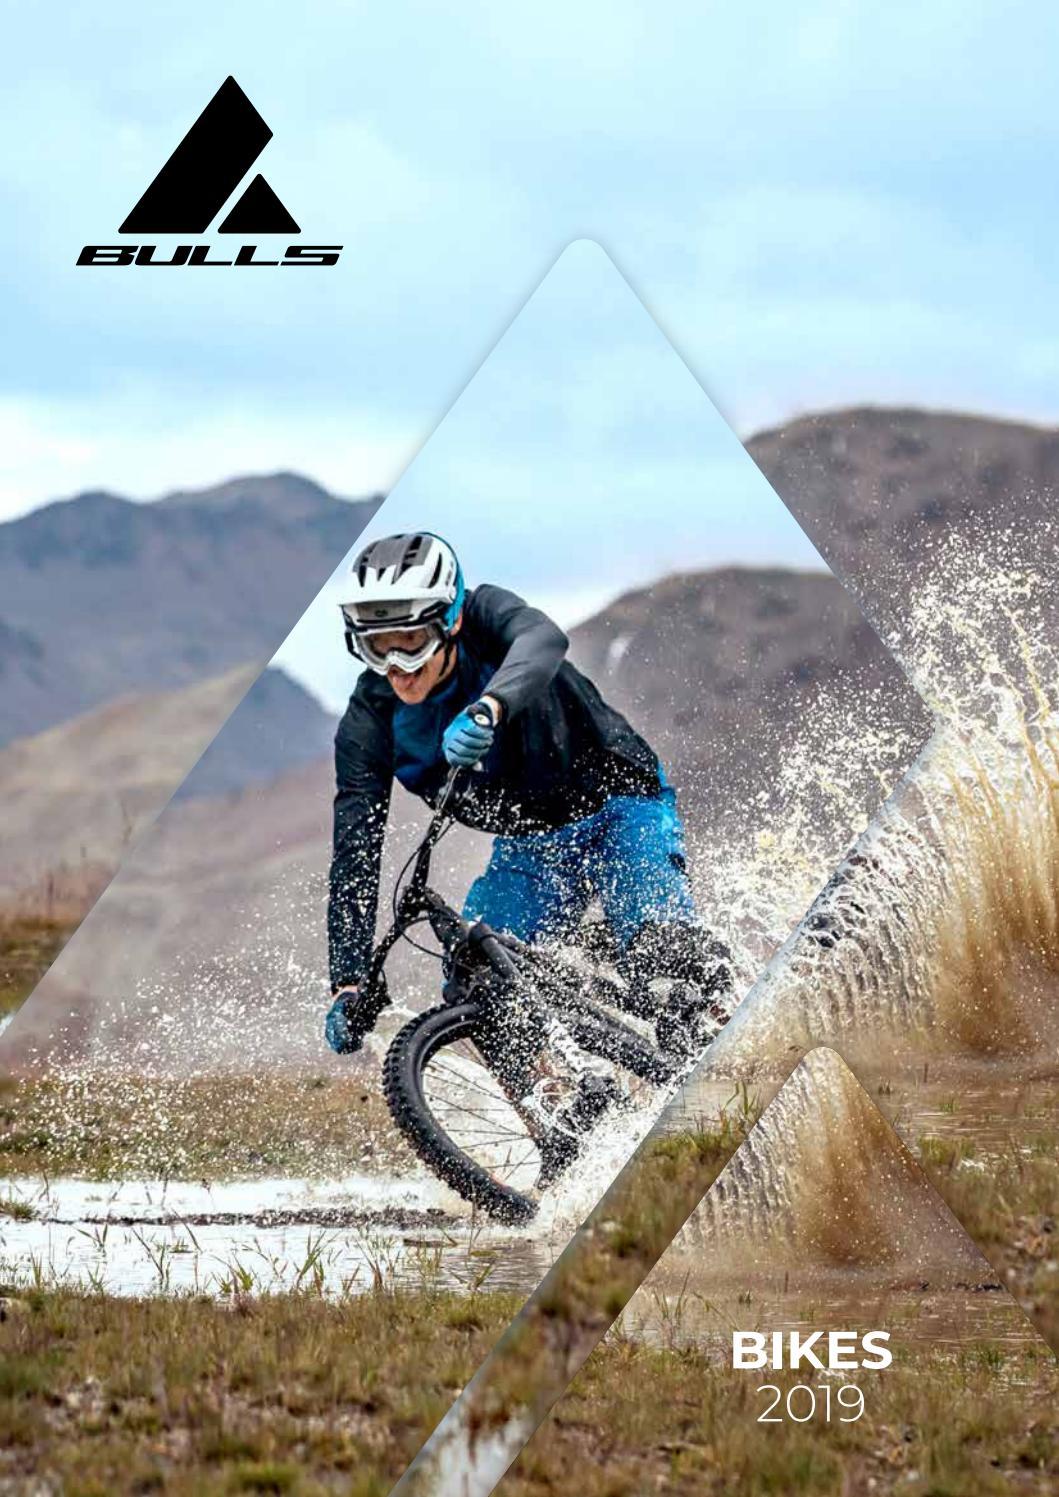 UD Carbon Sattelklemme M5 Titan Schraube Ti Lightwieght Bike Clamp